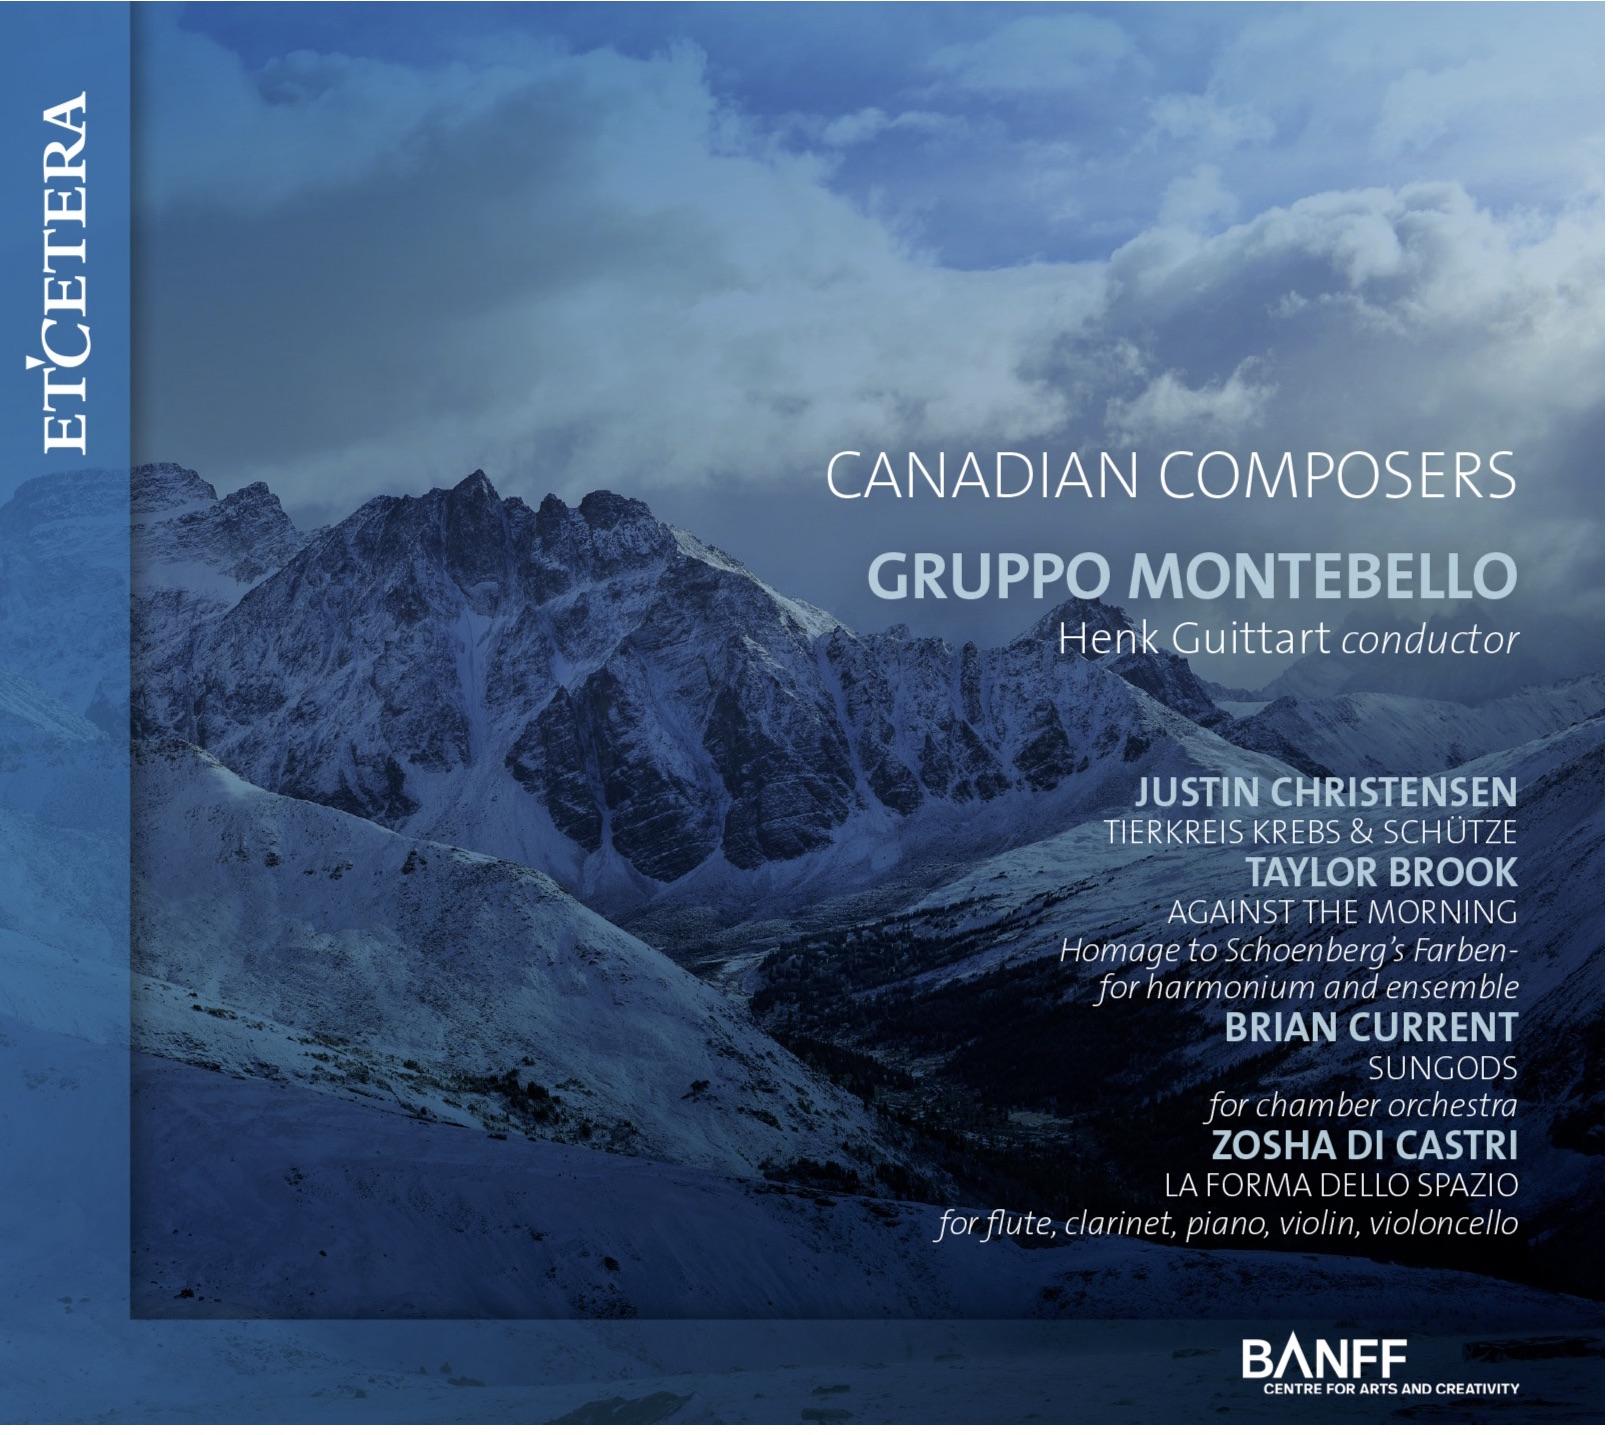 0.Canadian Composers KTC 9006.jpg